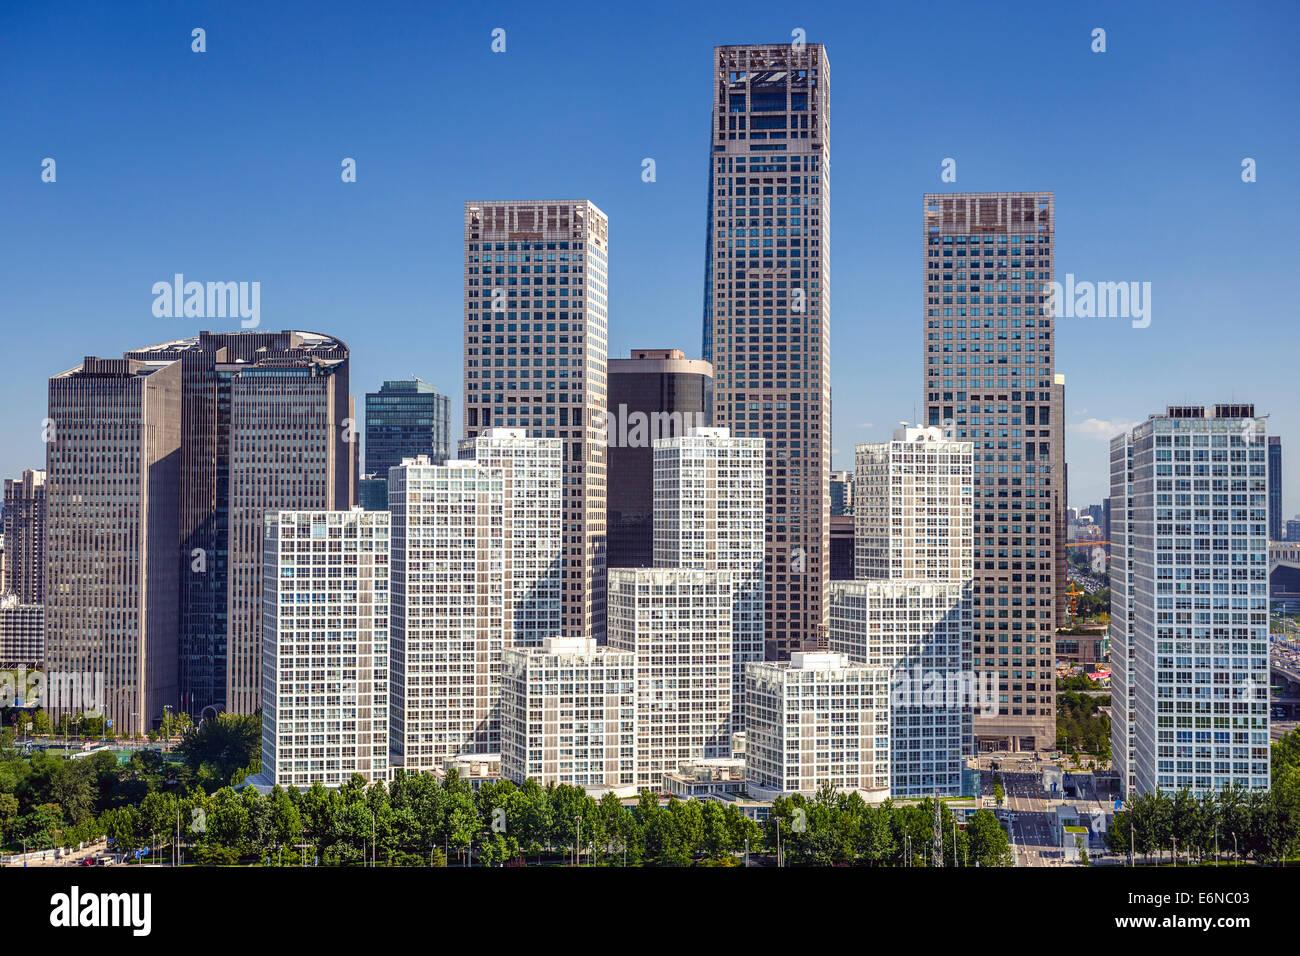 Bejing, China CBD city skyline. - Stock Image